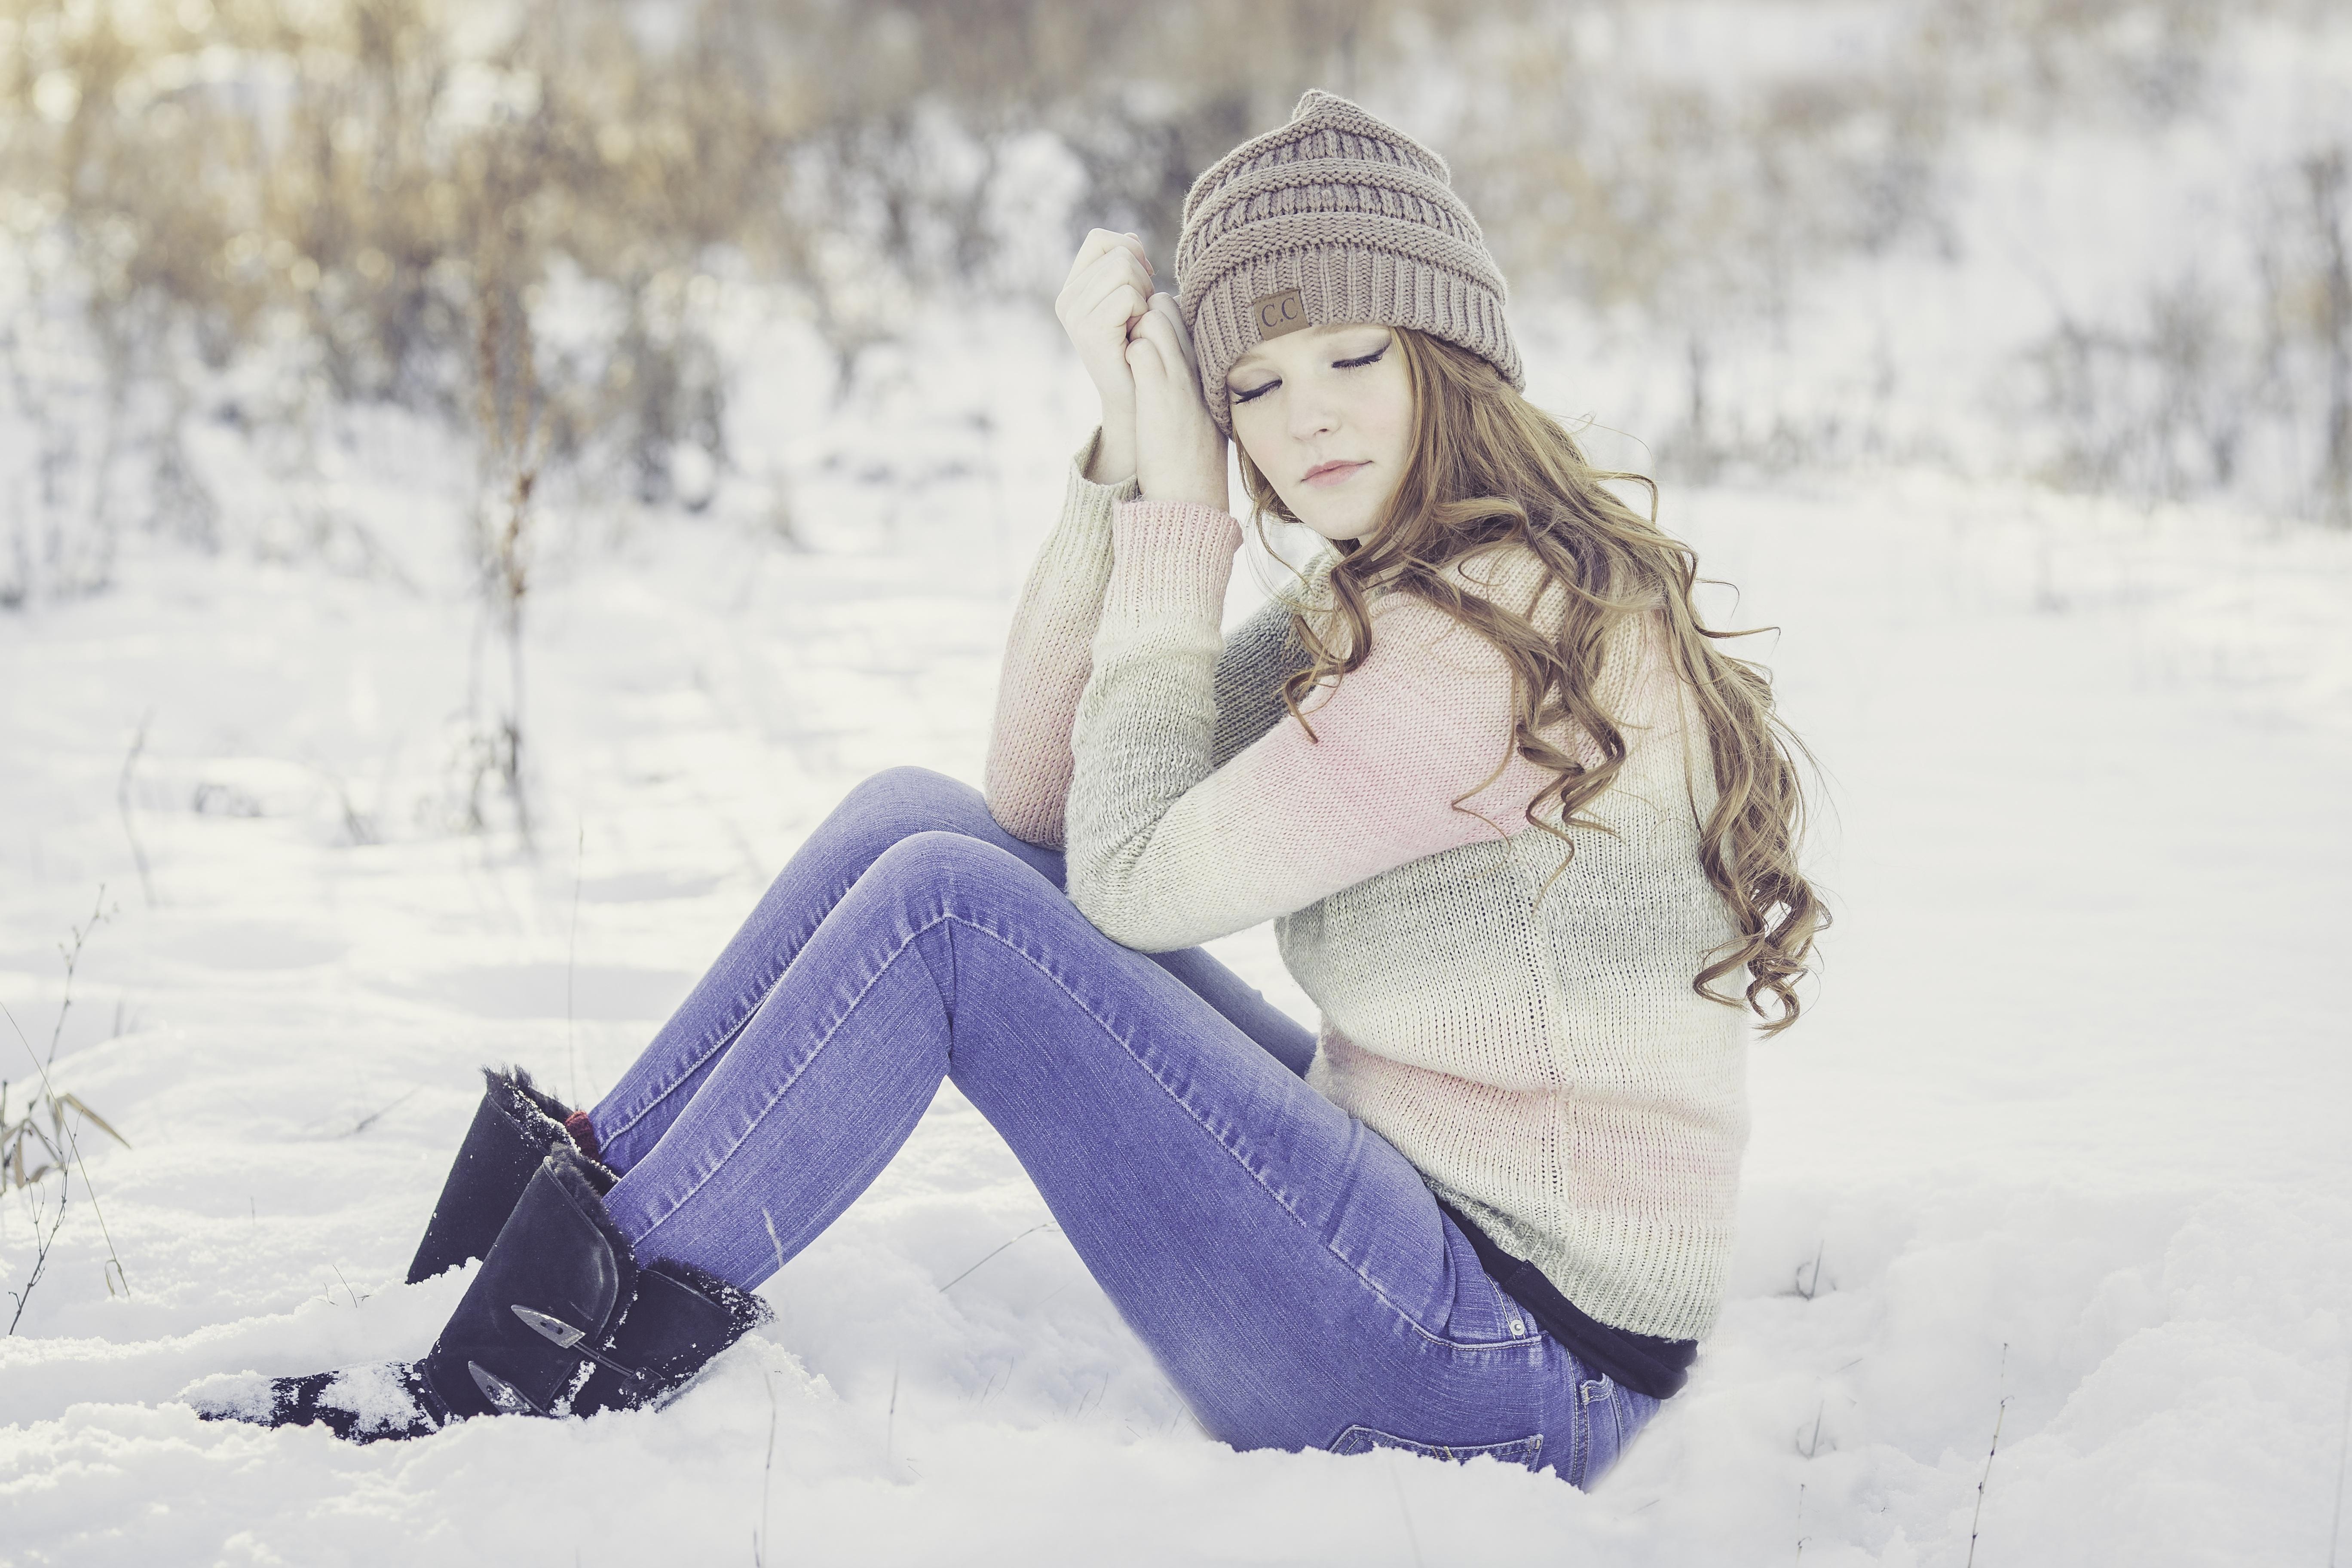 такое картинки с красивыми сидящими на снегу двери